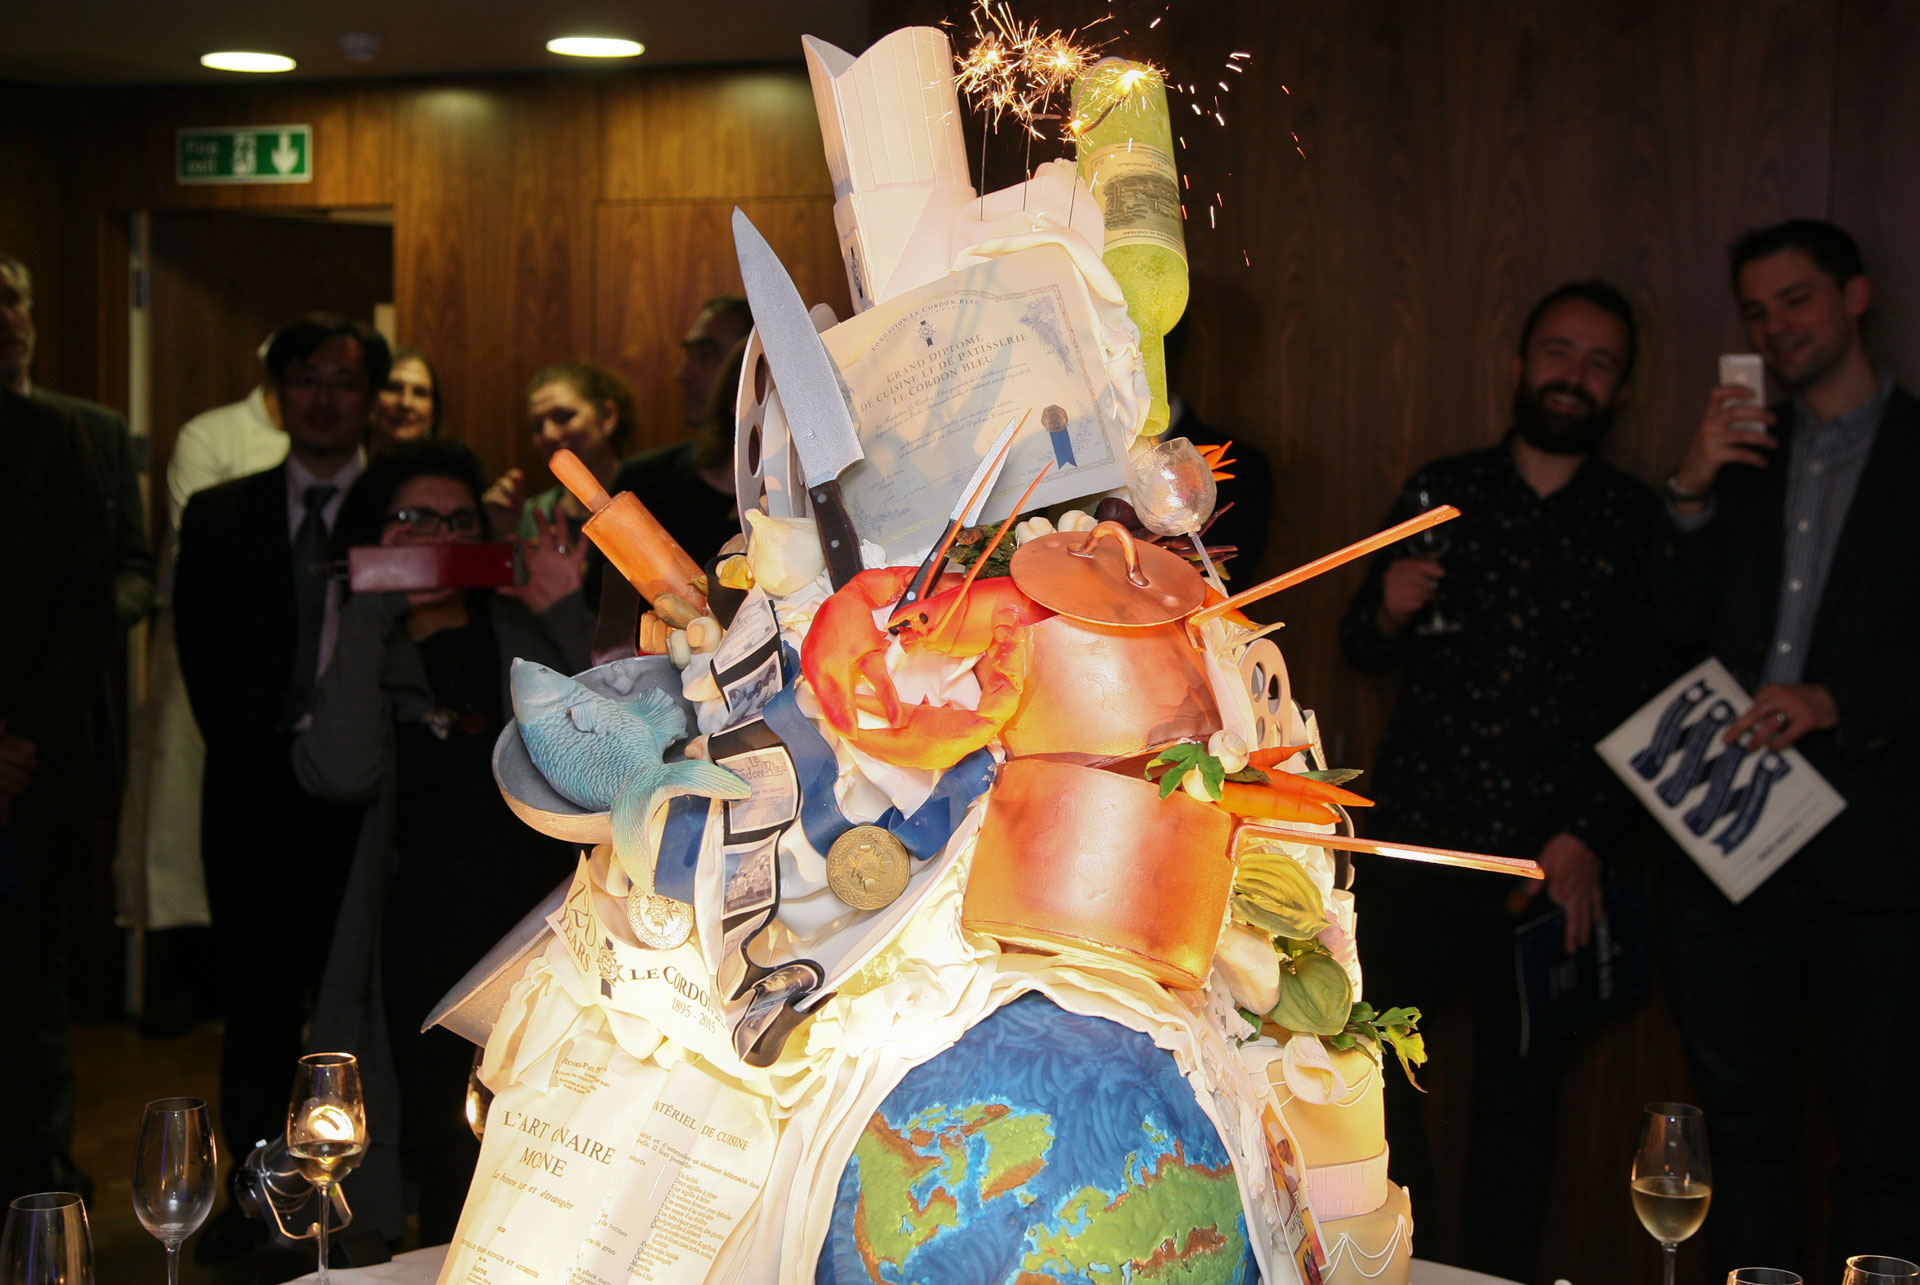 Le cordon bleu london -celebration cake 120 years anniversary